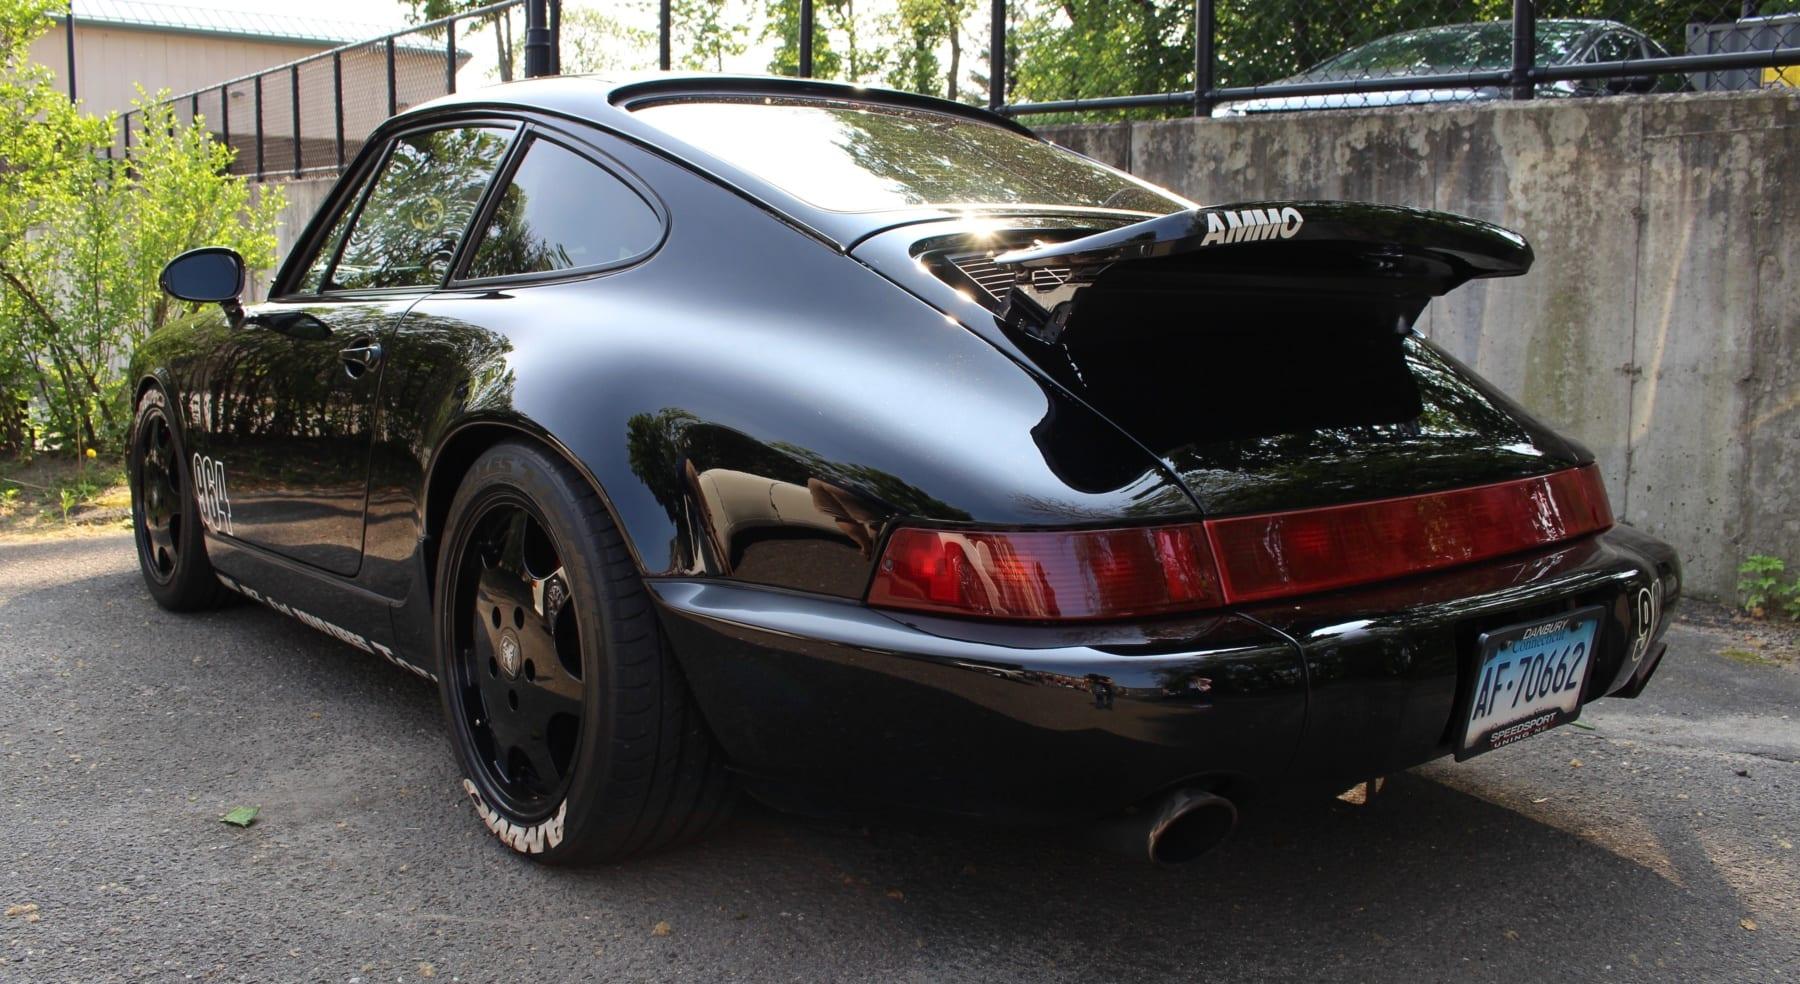 Friend of Hooniverse Larry Kosilla of AMMO NYC's Porsche 964 911